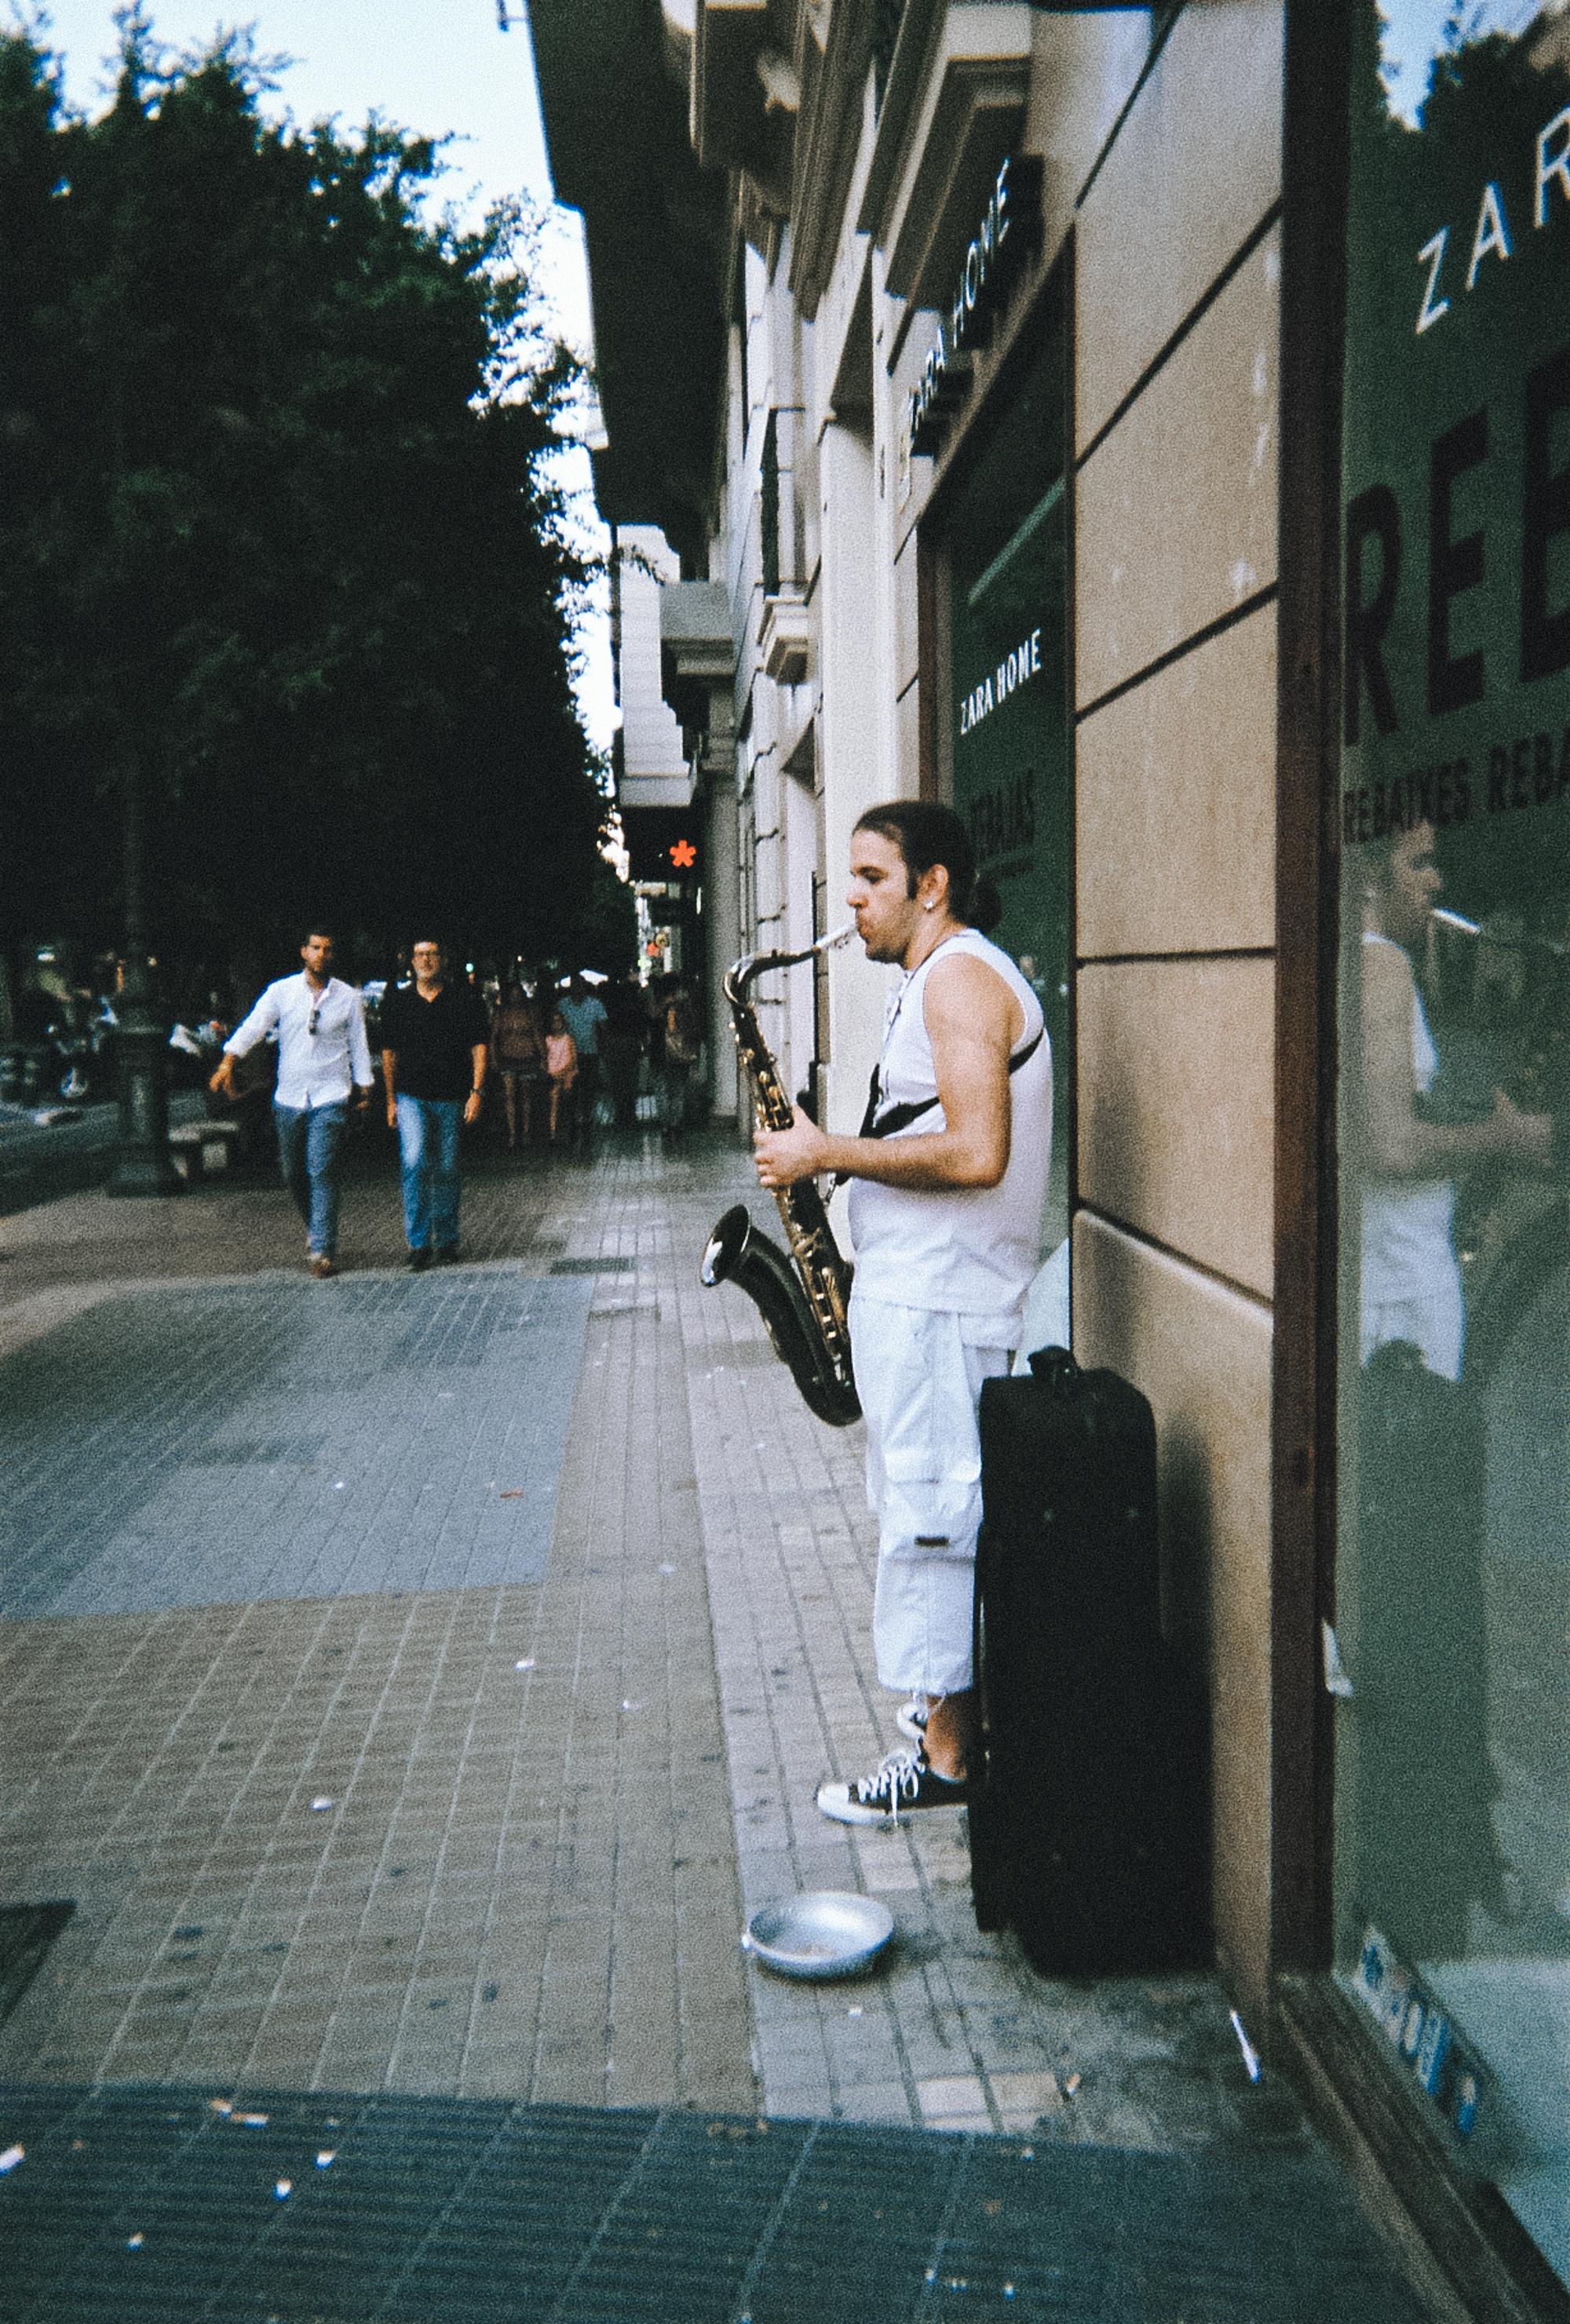 Street musician in Valencia, Spain